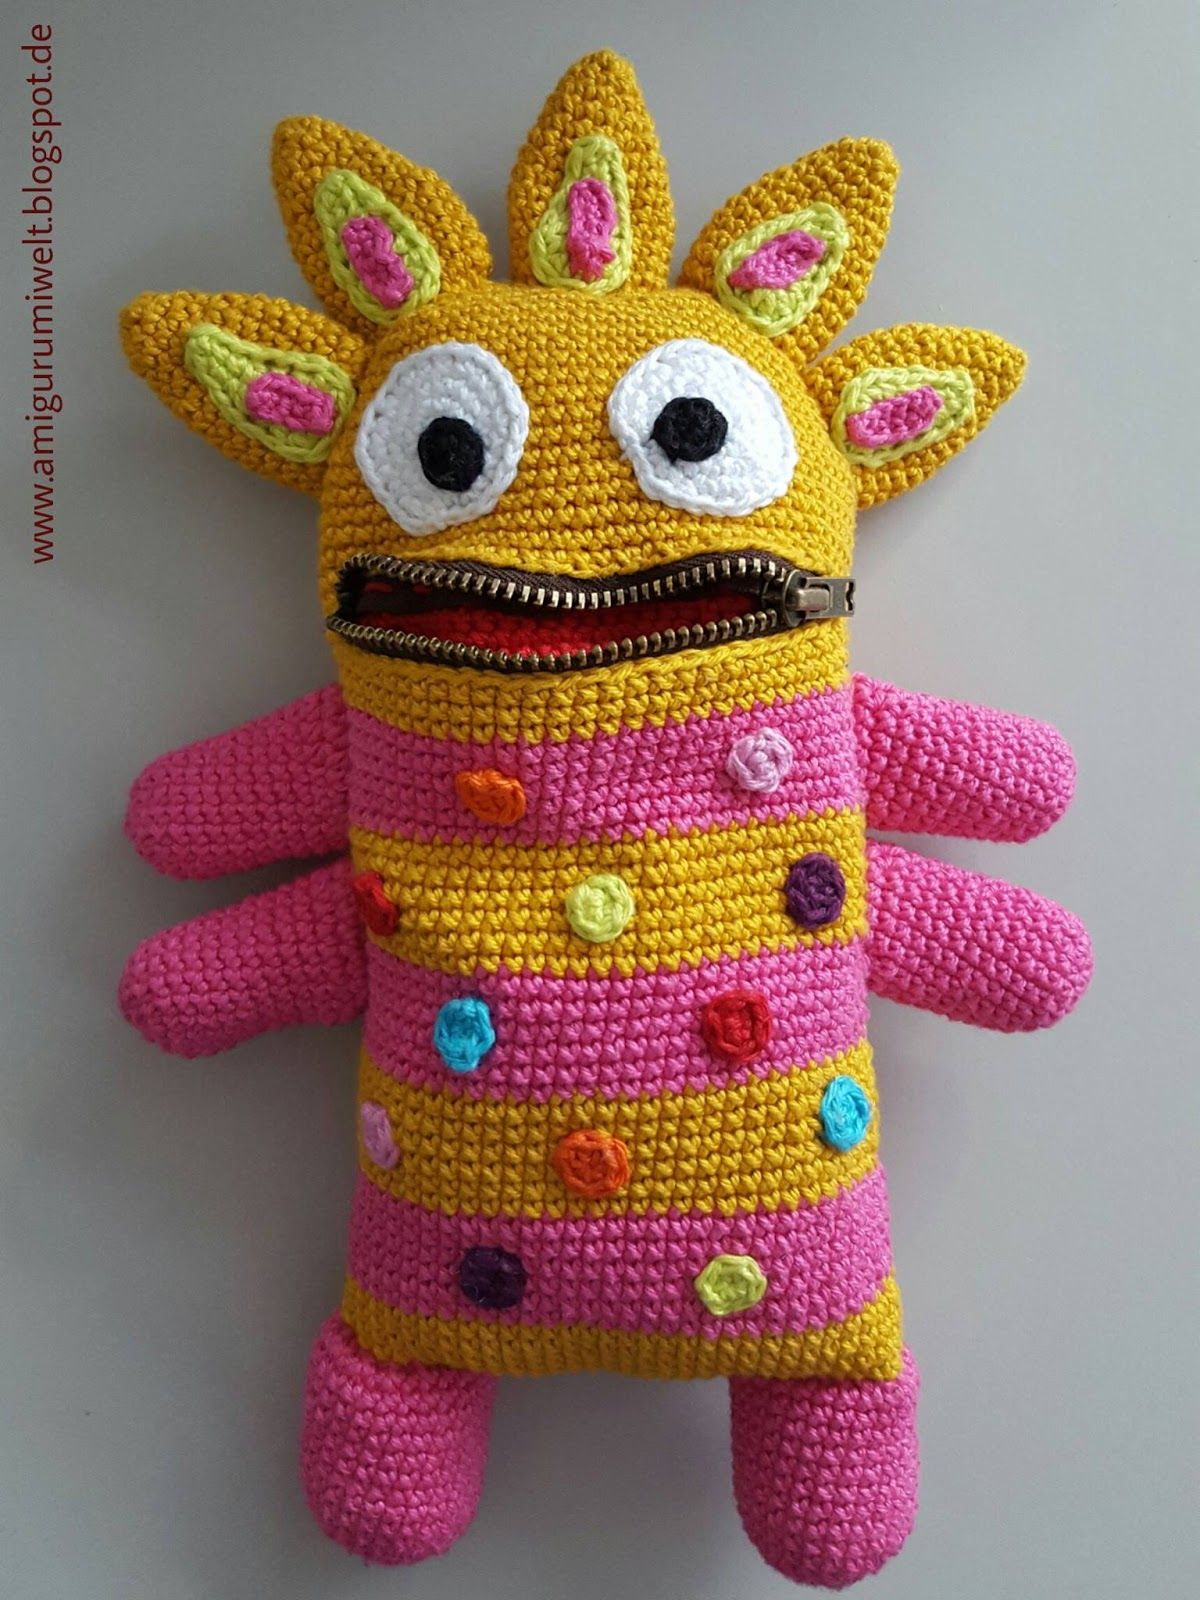 Amigurumi Häkeln Crochet Kostenlos Free Monster Sorgenfresser